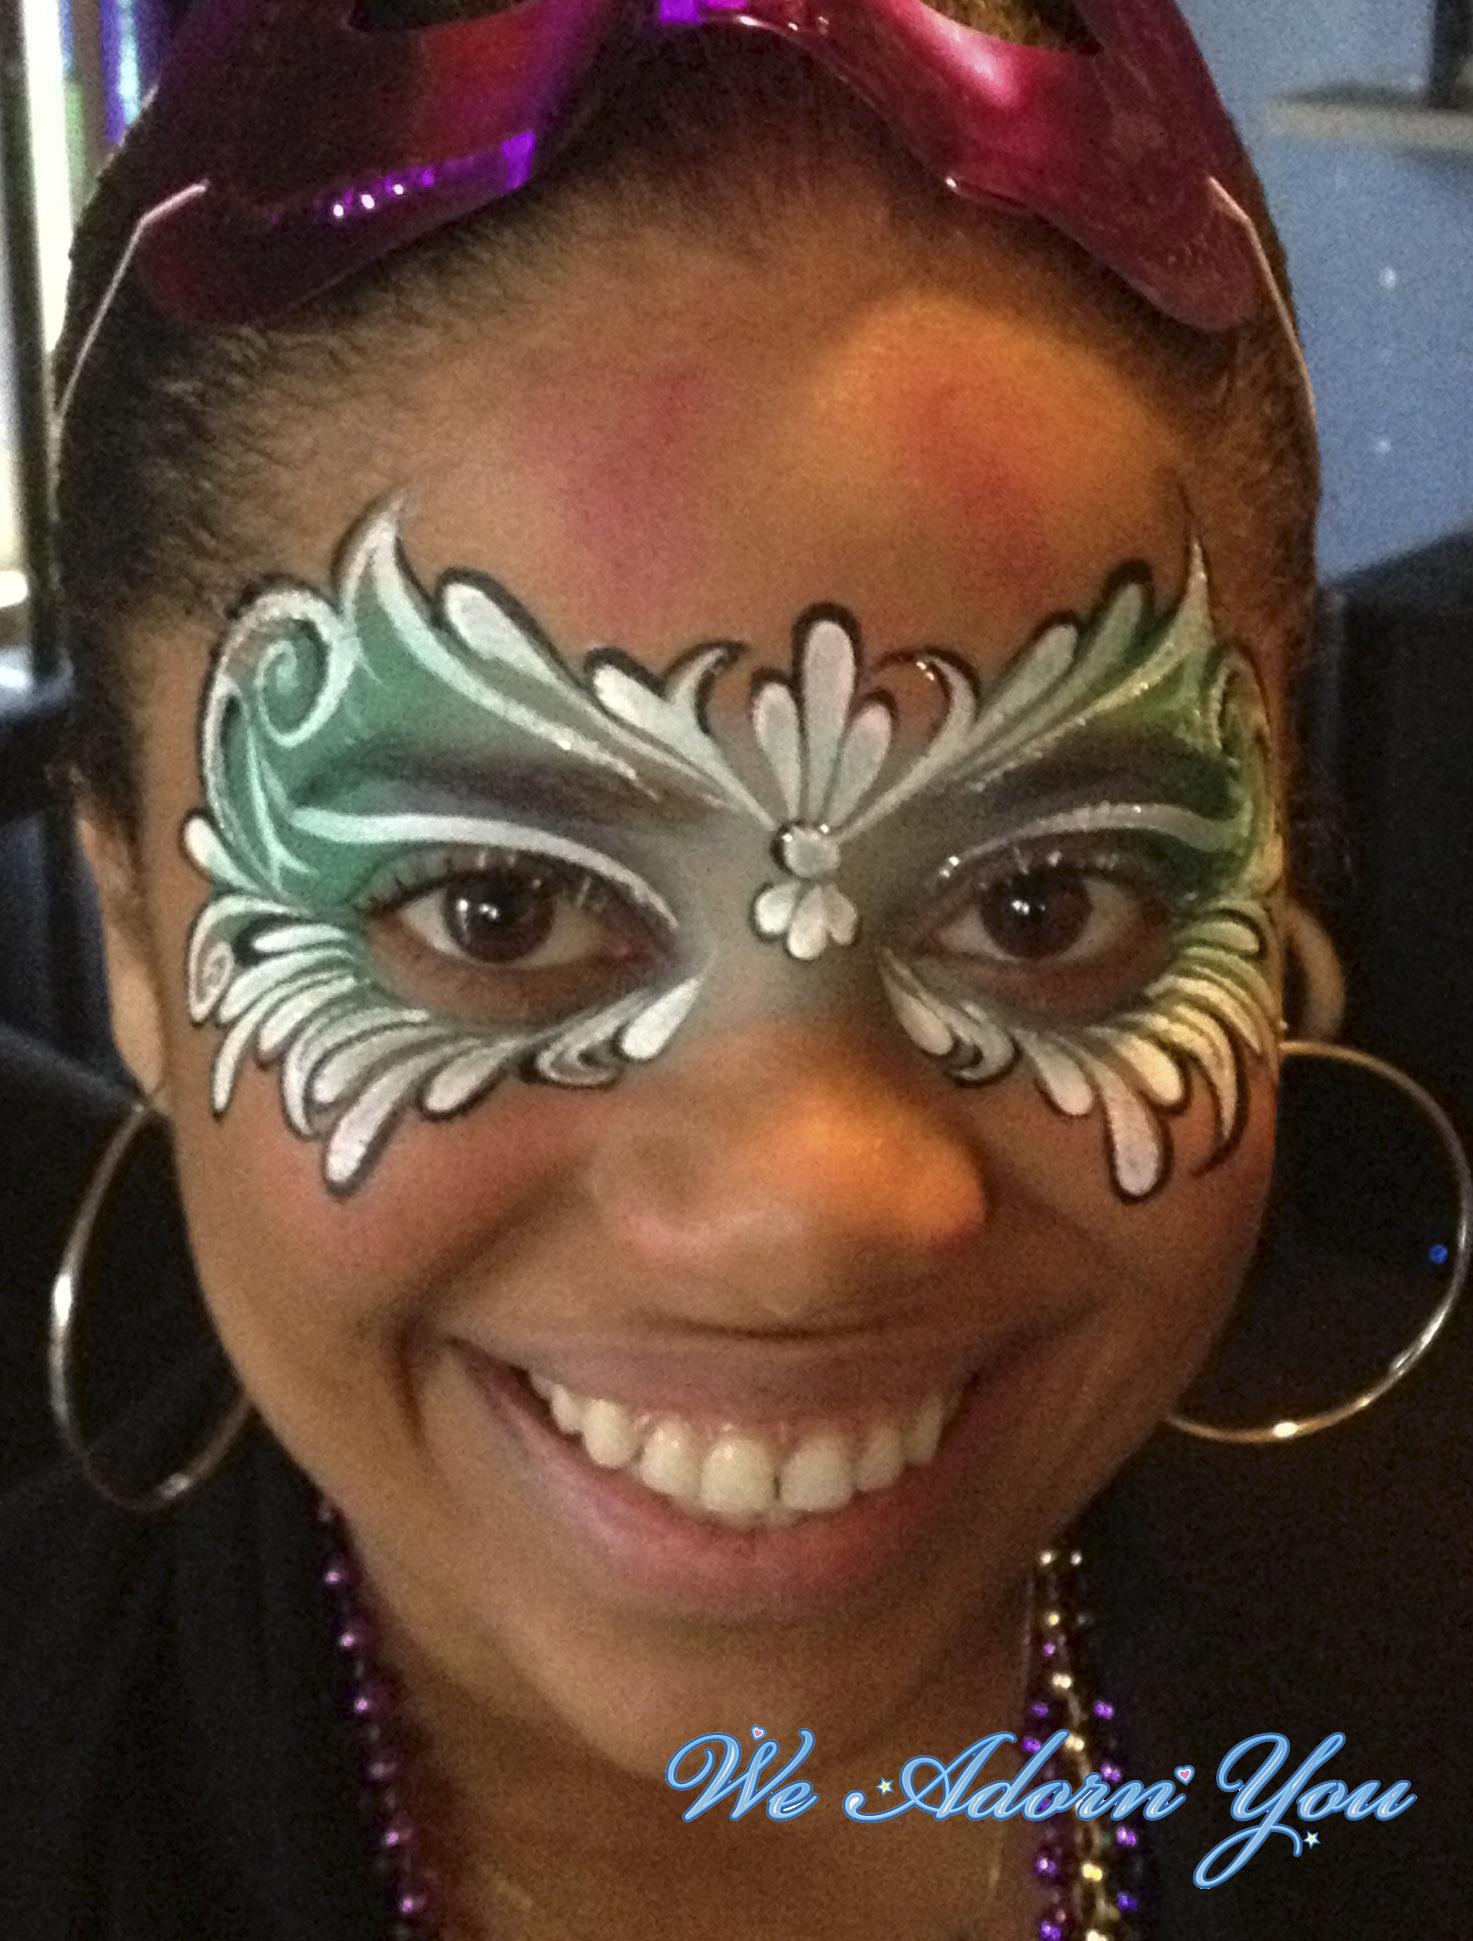 Face Painting Mardi Gras Mask- We Adorn You.jpg